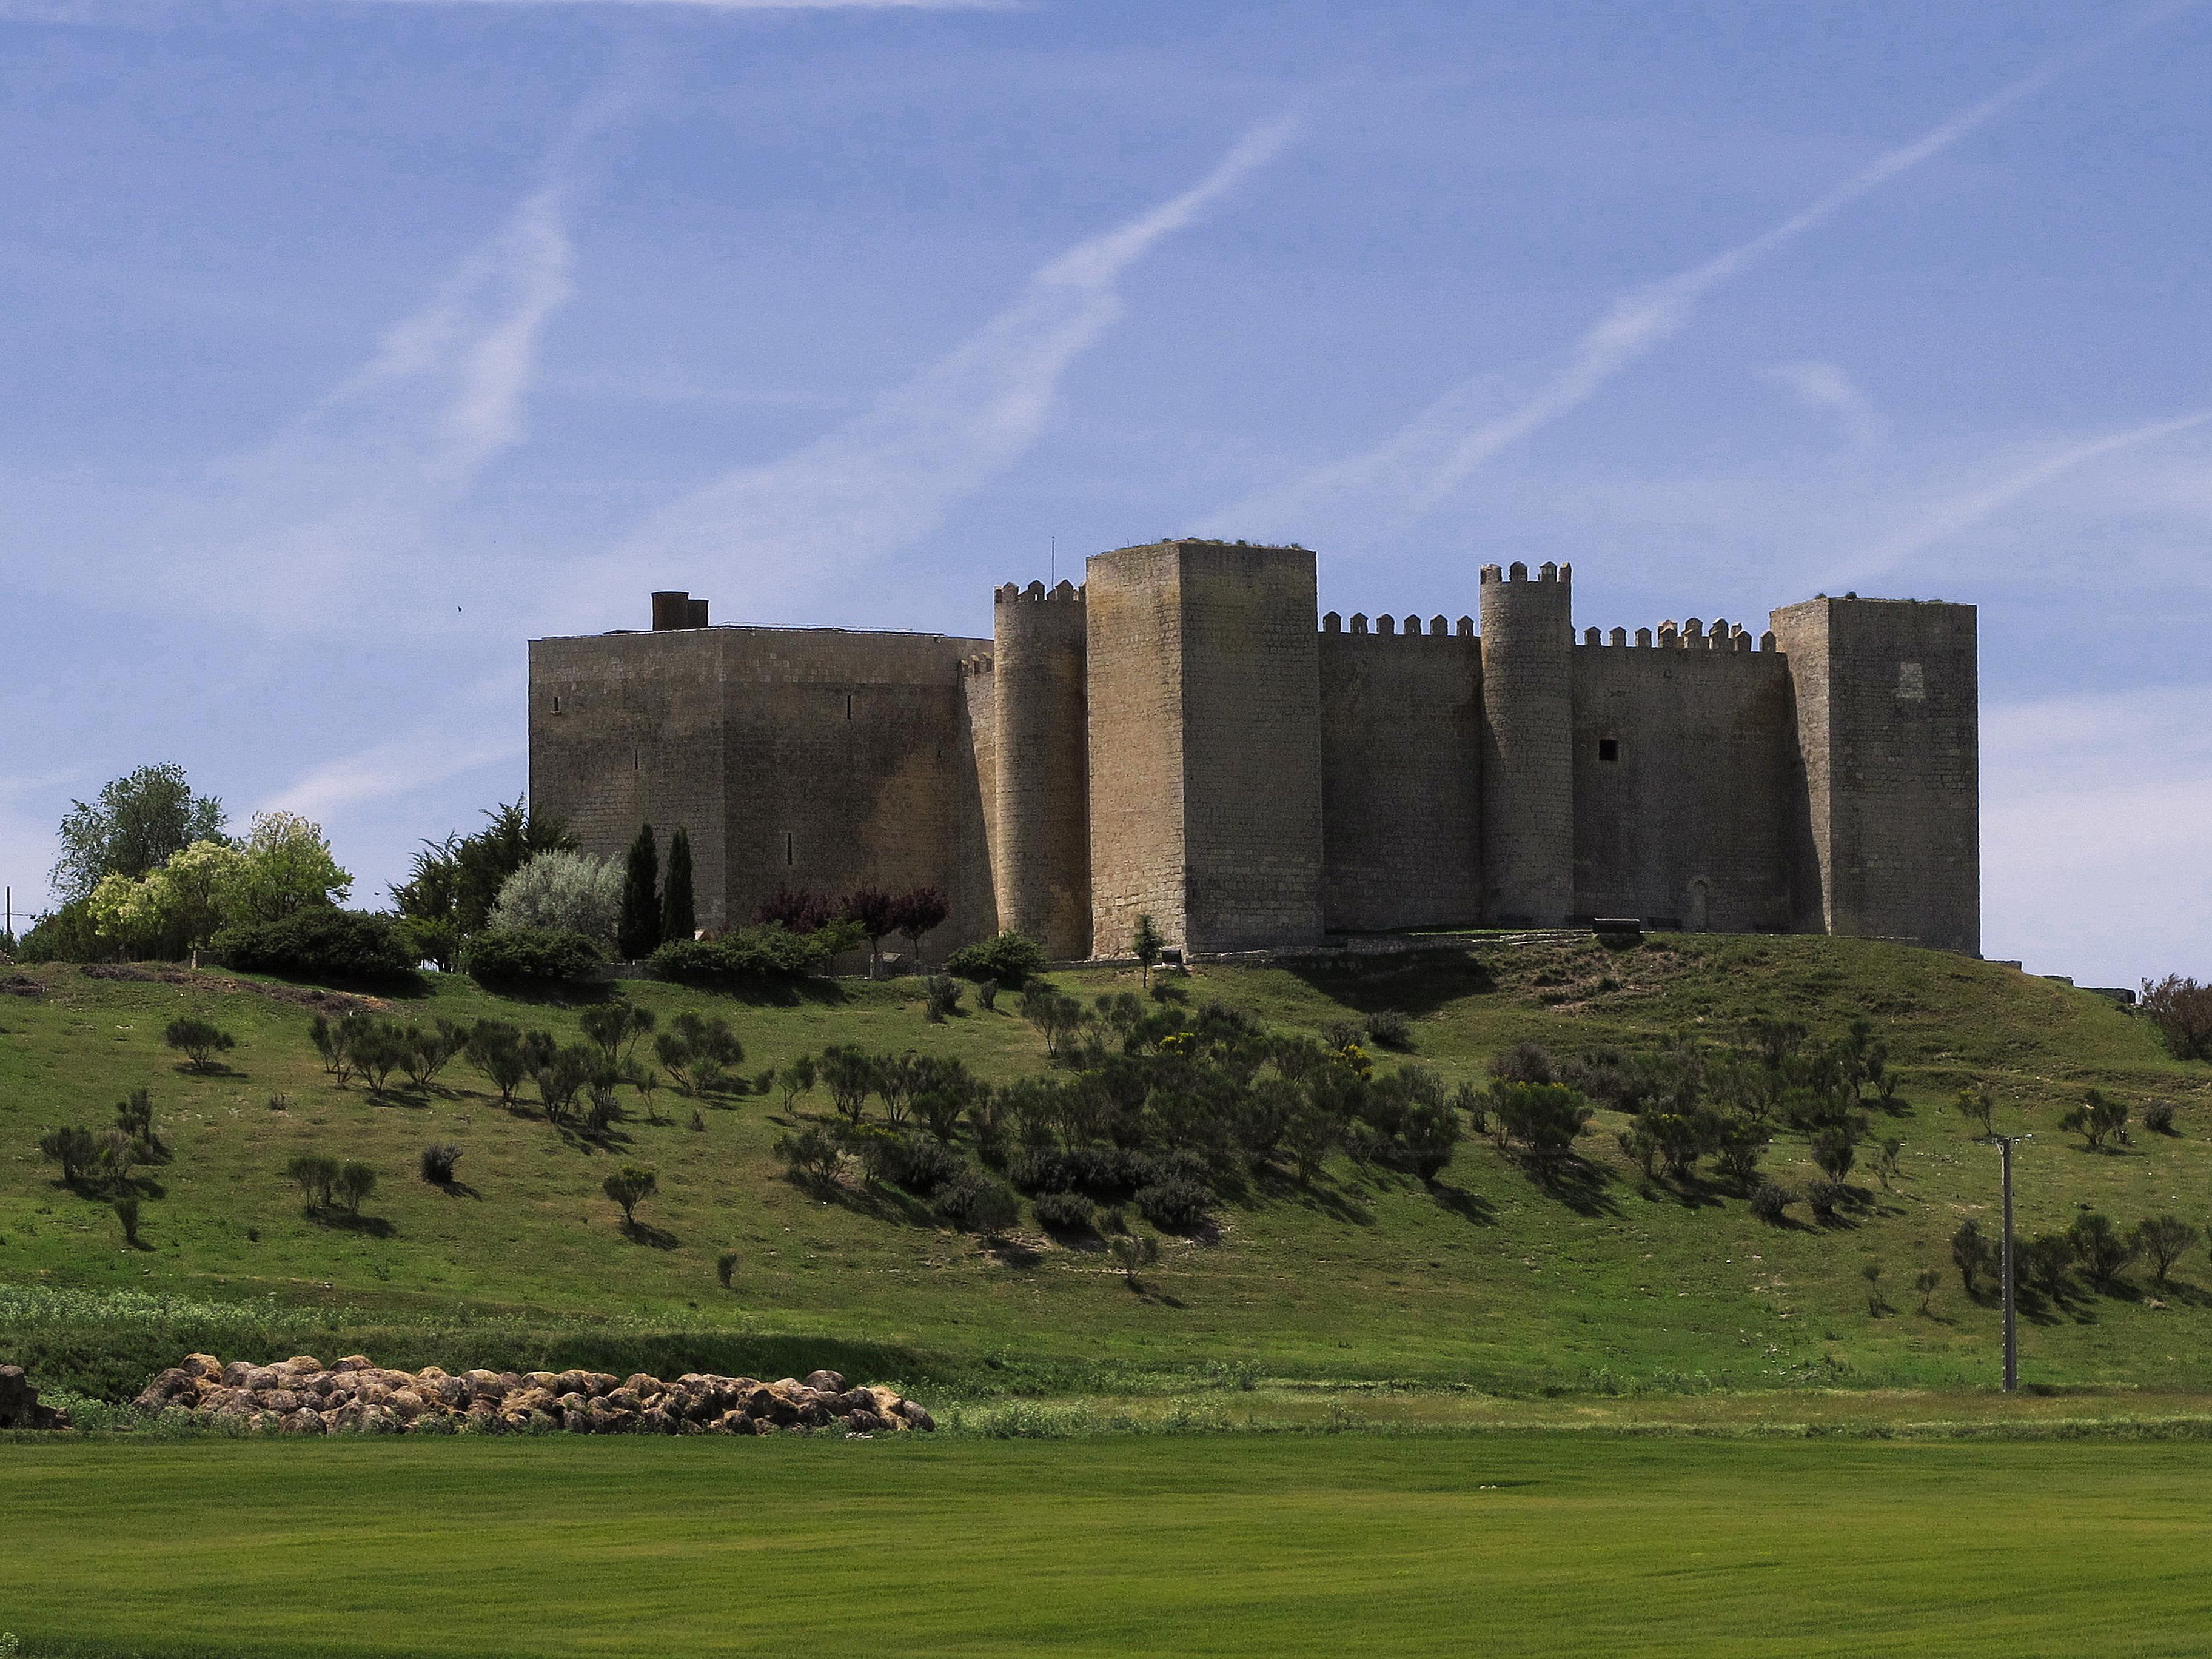 castle in Castile, Spain